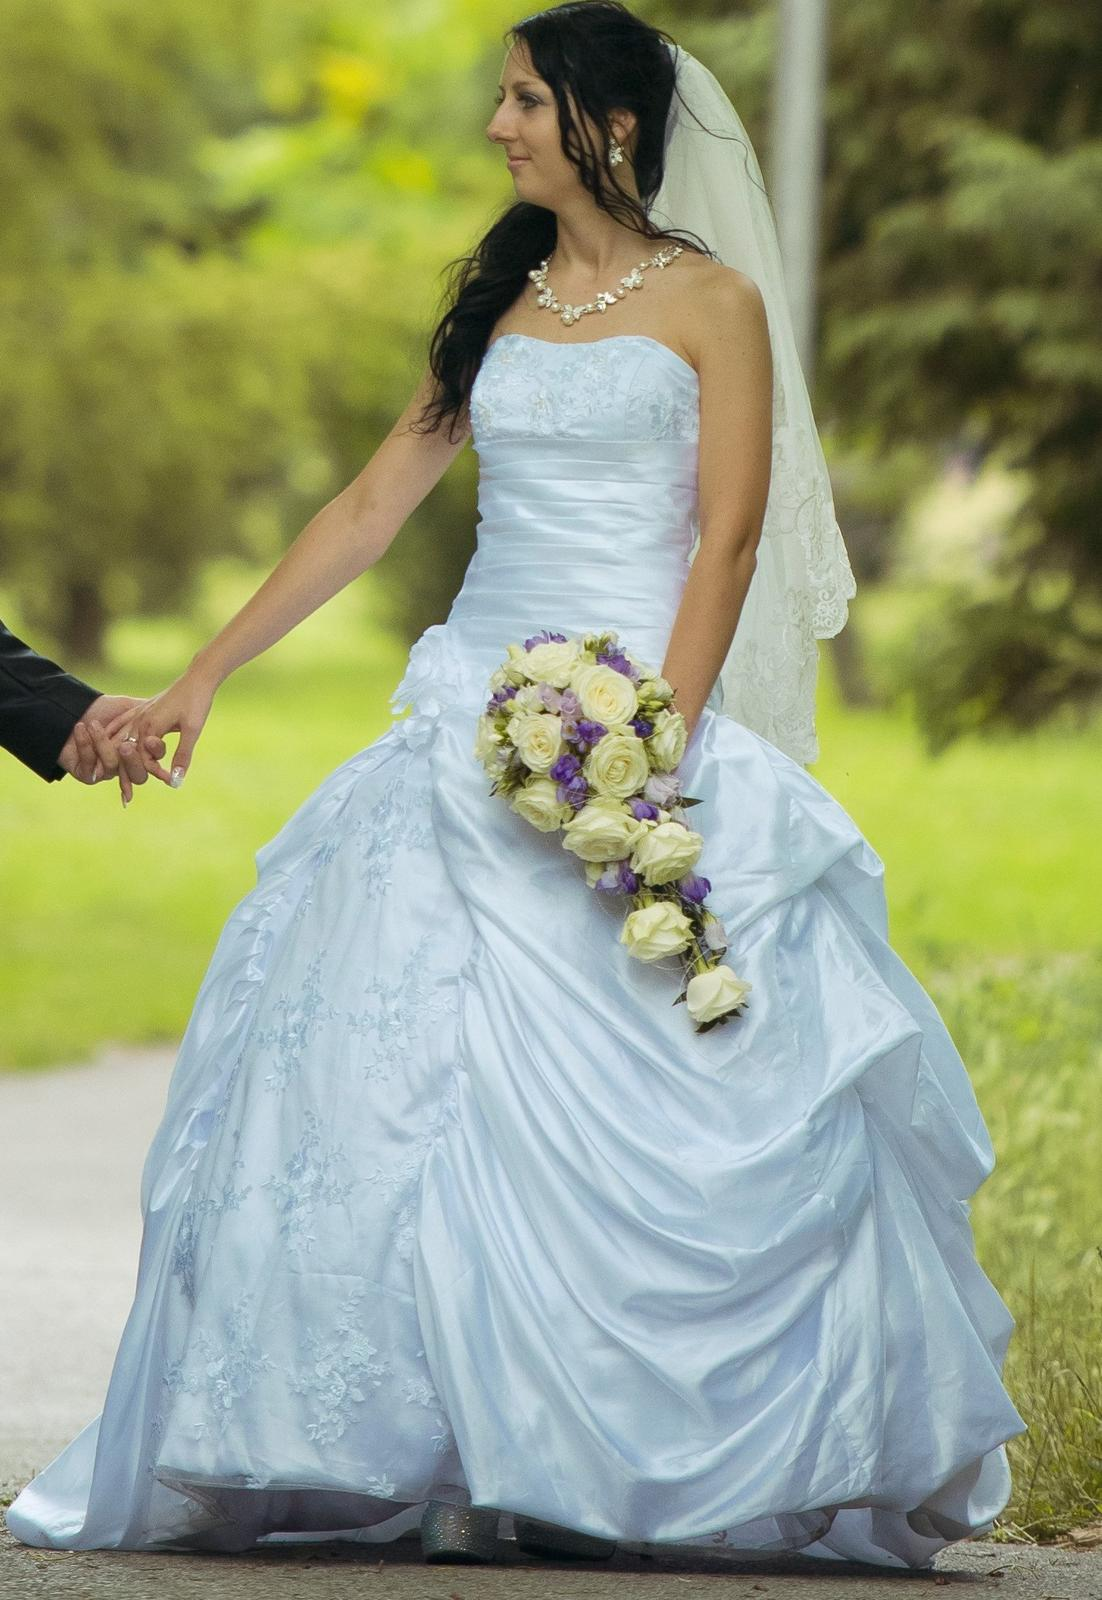 Jedenkrát oblečené svadobné šaty - Obrázok č. 1